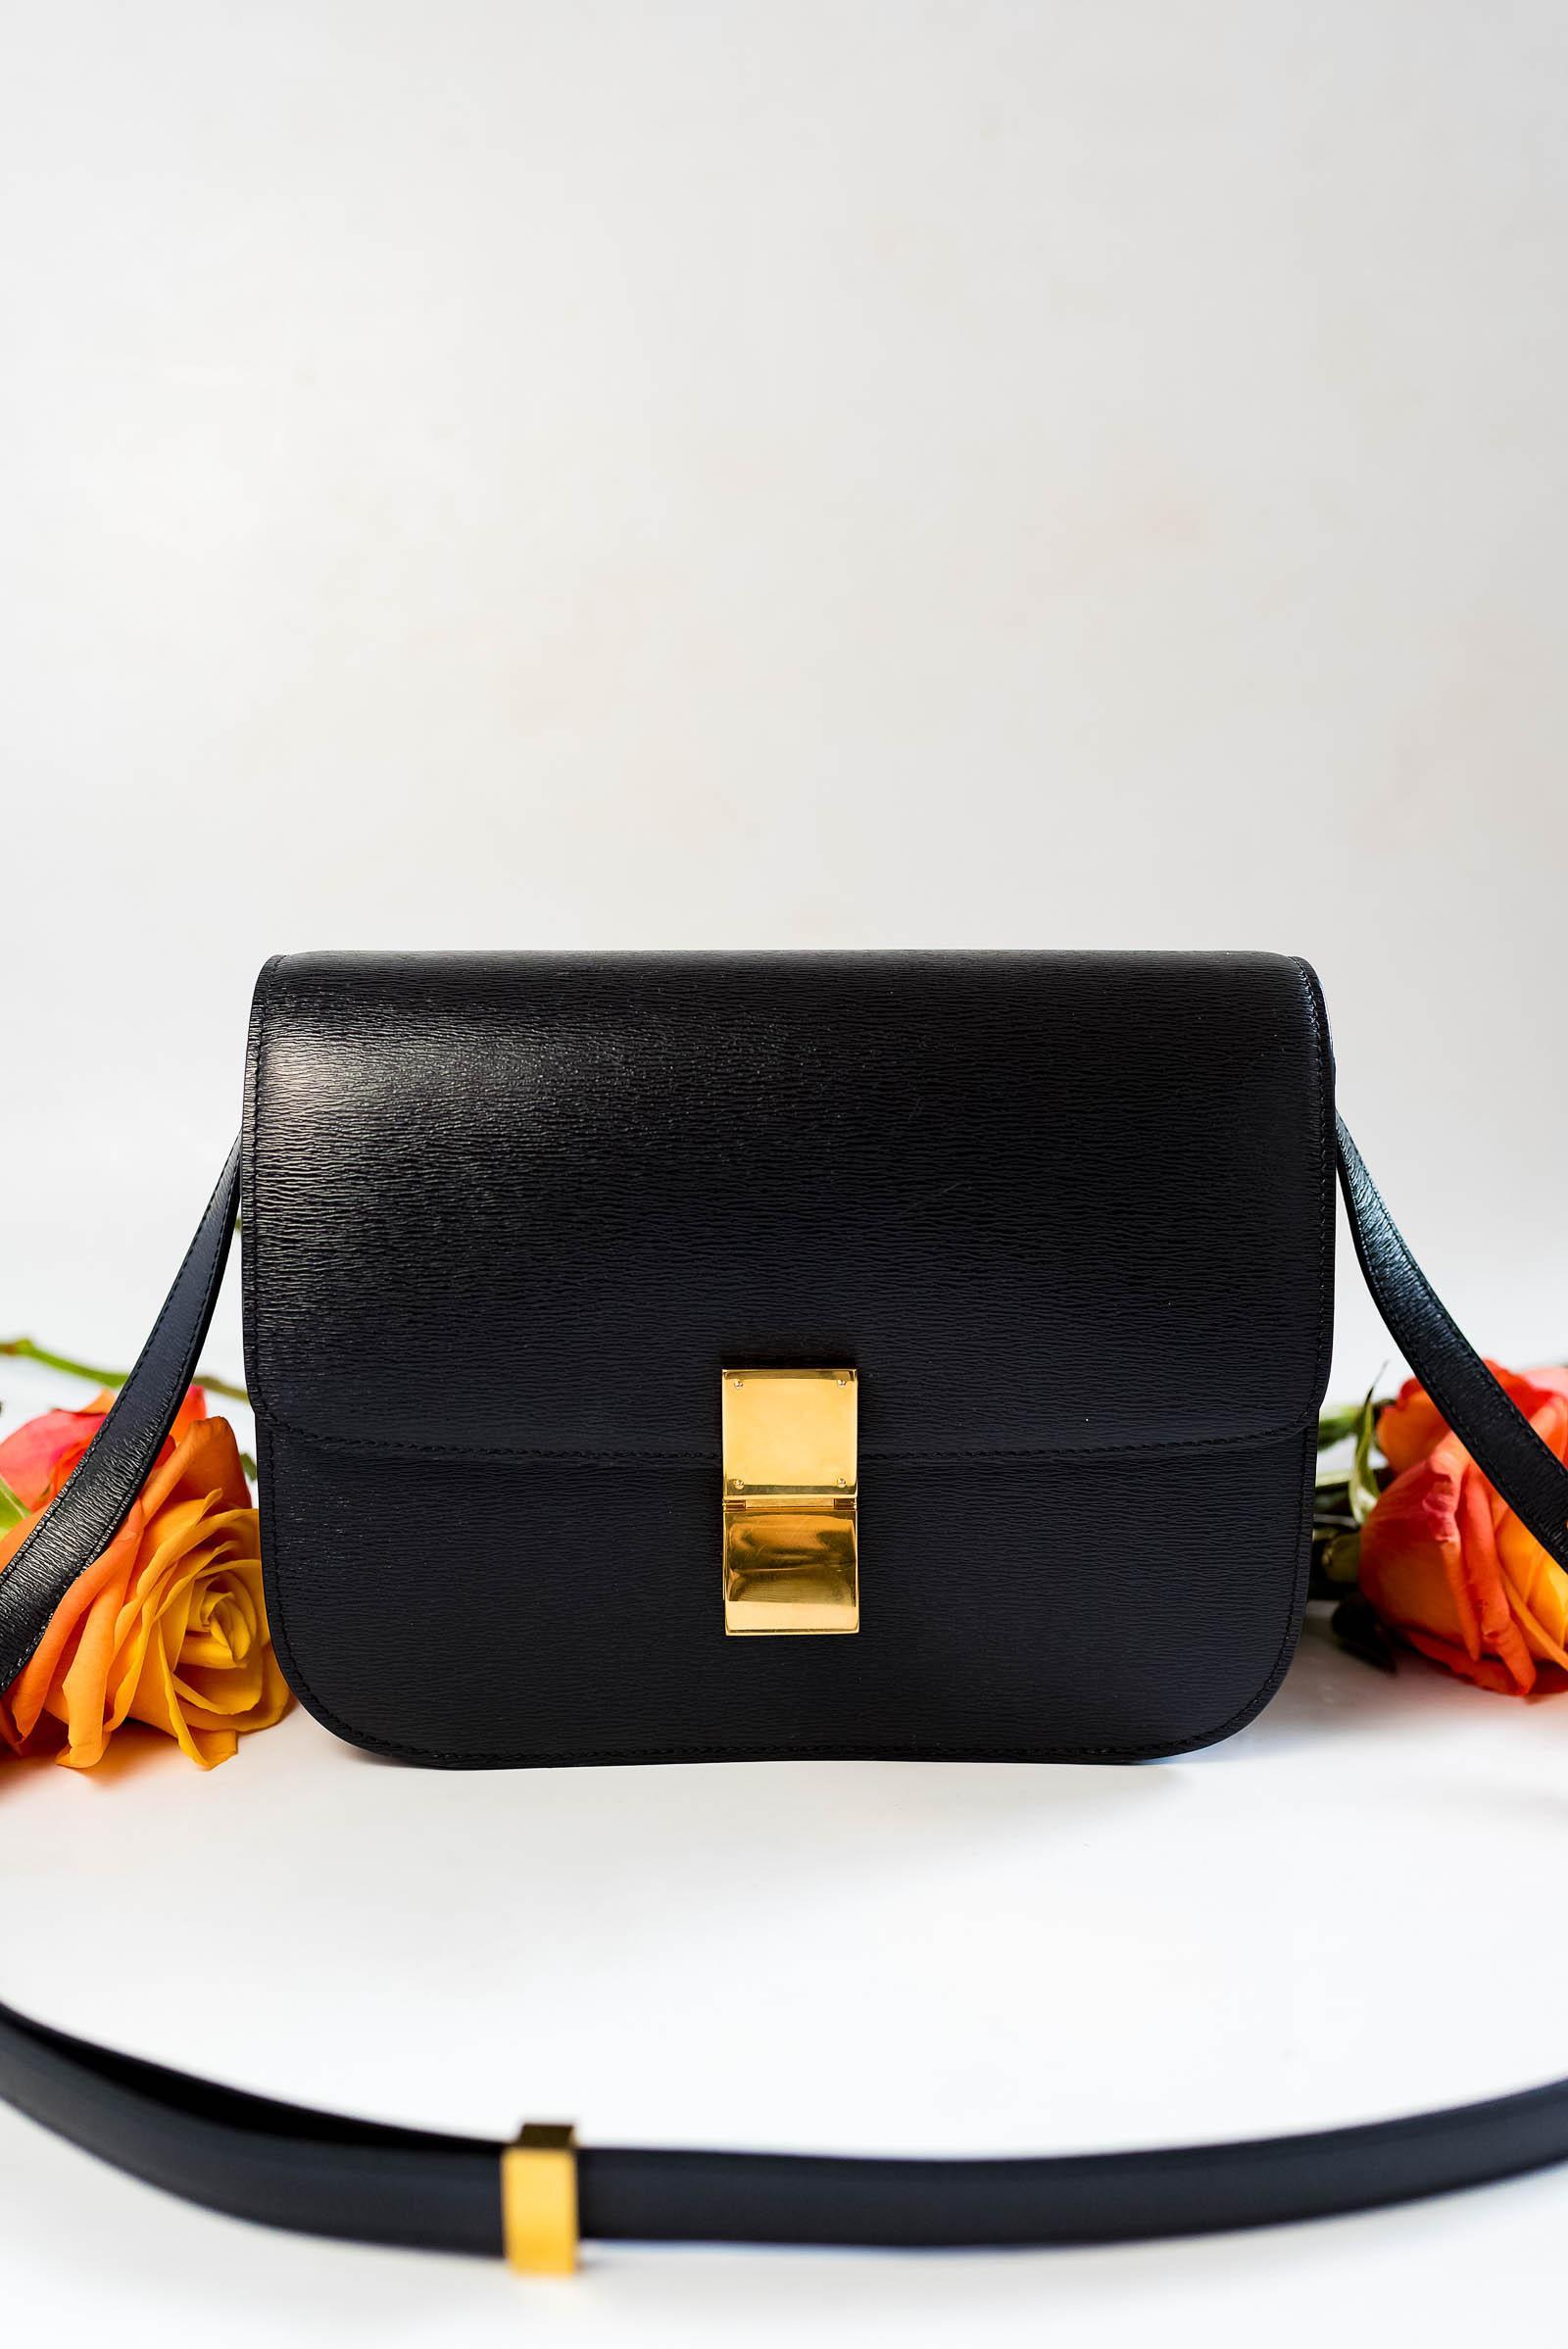 Céline Box Bag Review, 2015 Medium Black